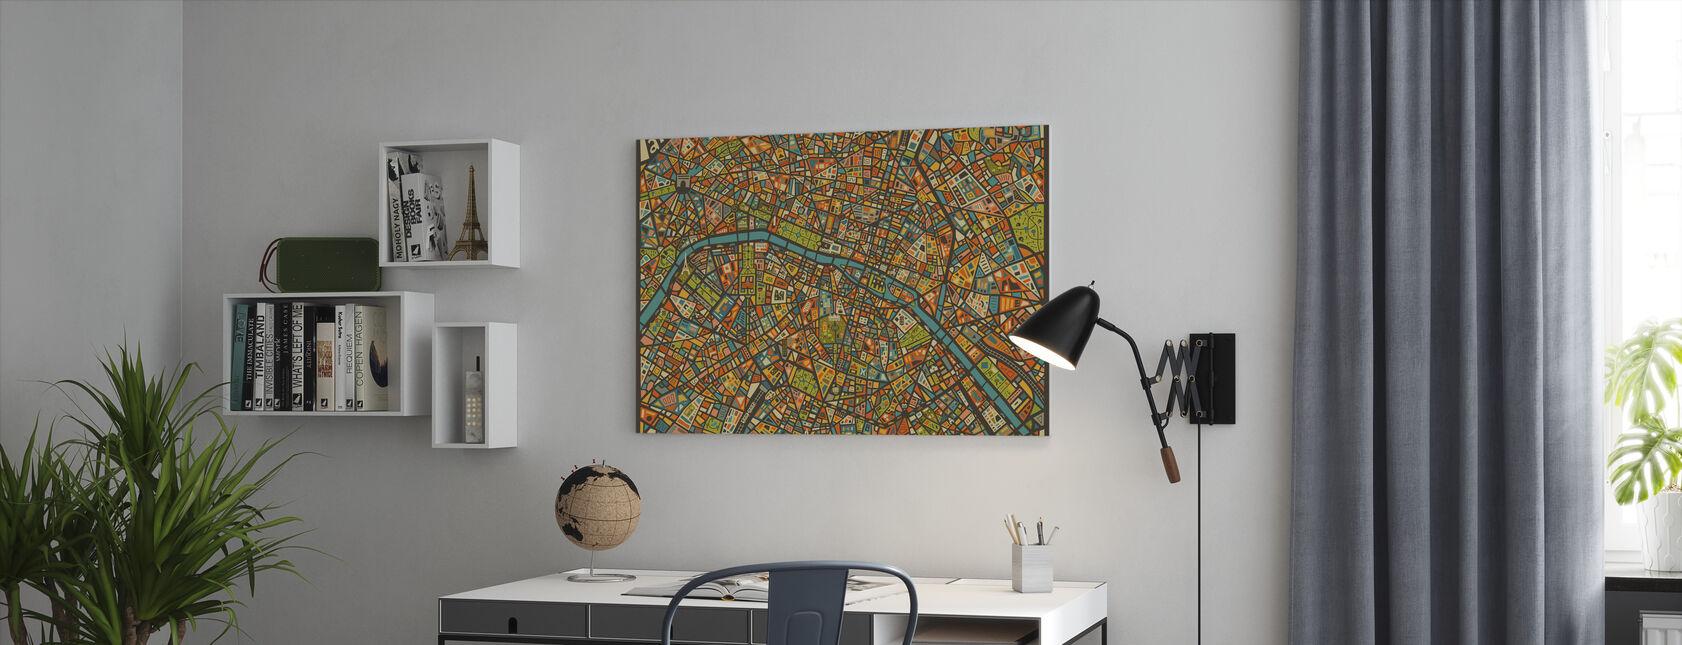 Paris Street Map - Canvas print - Office